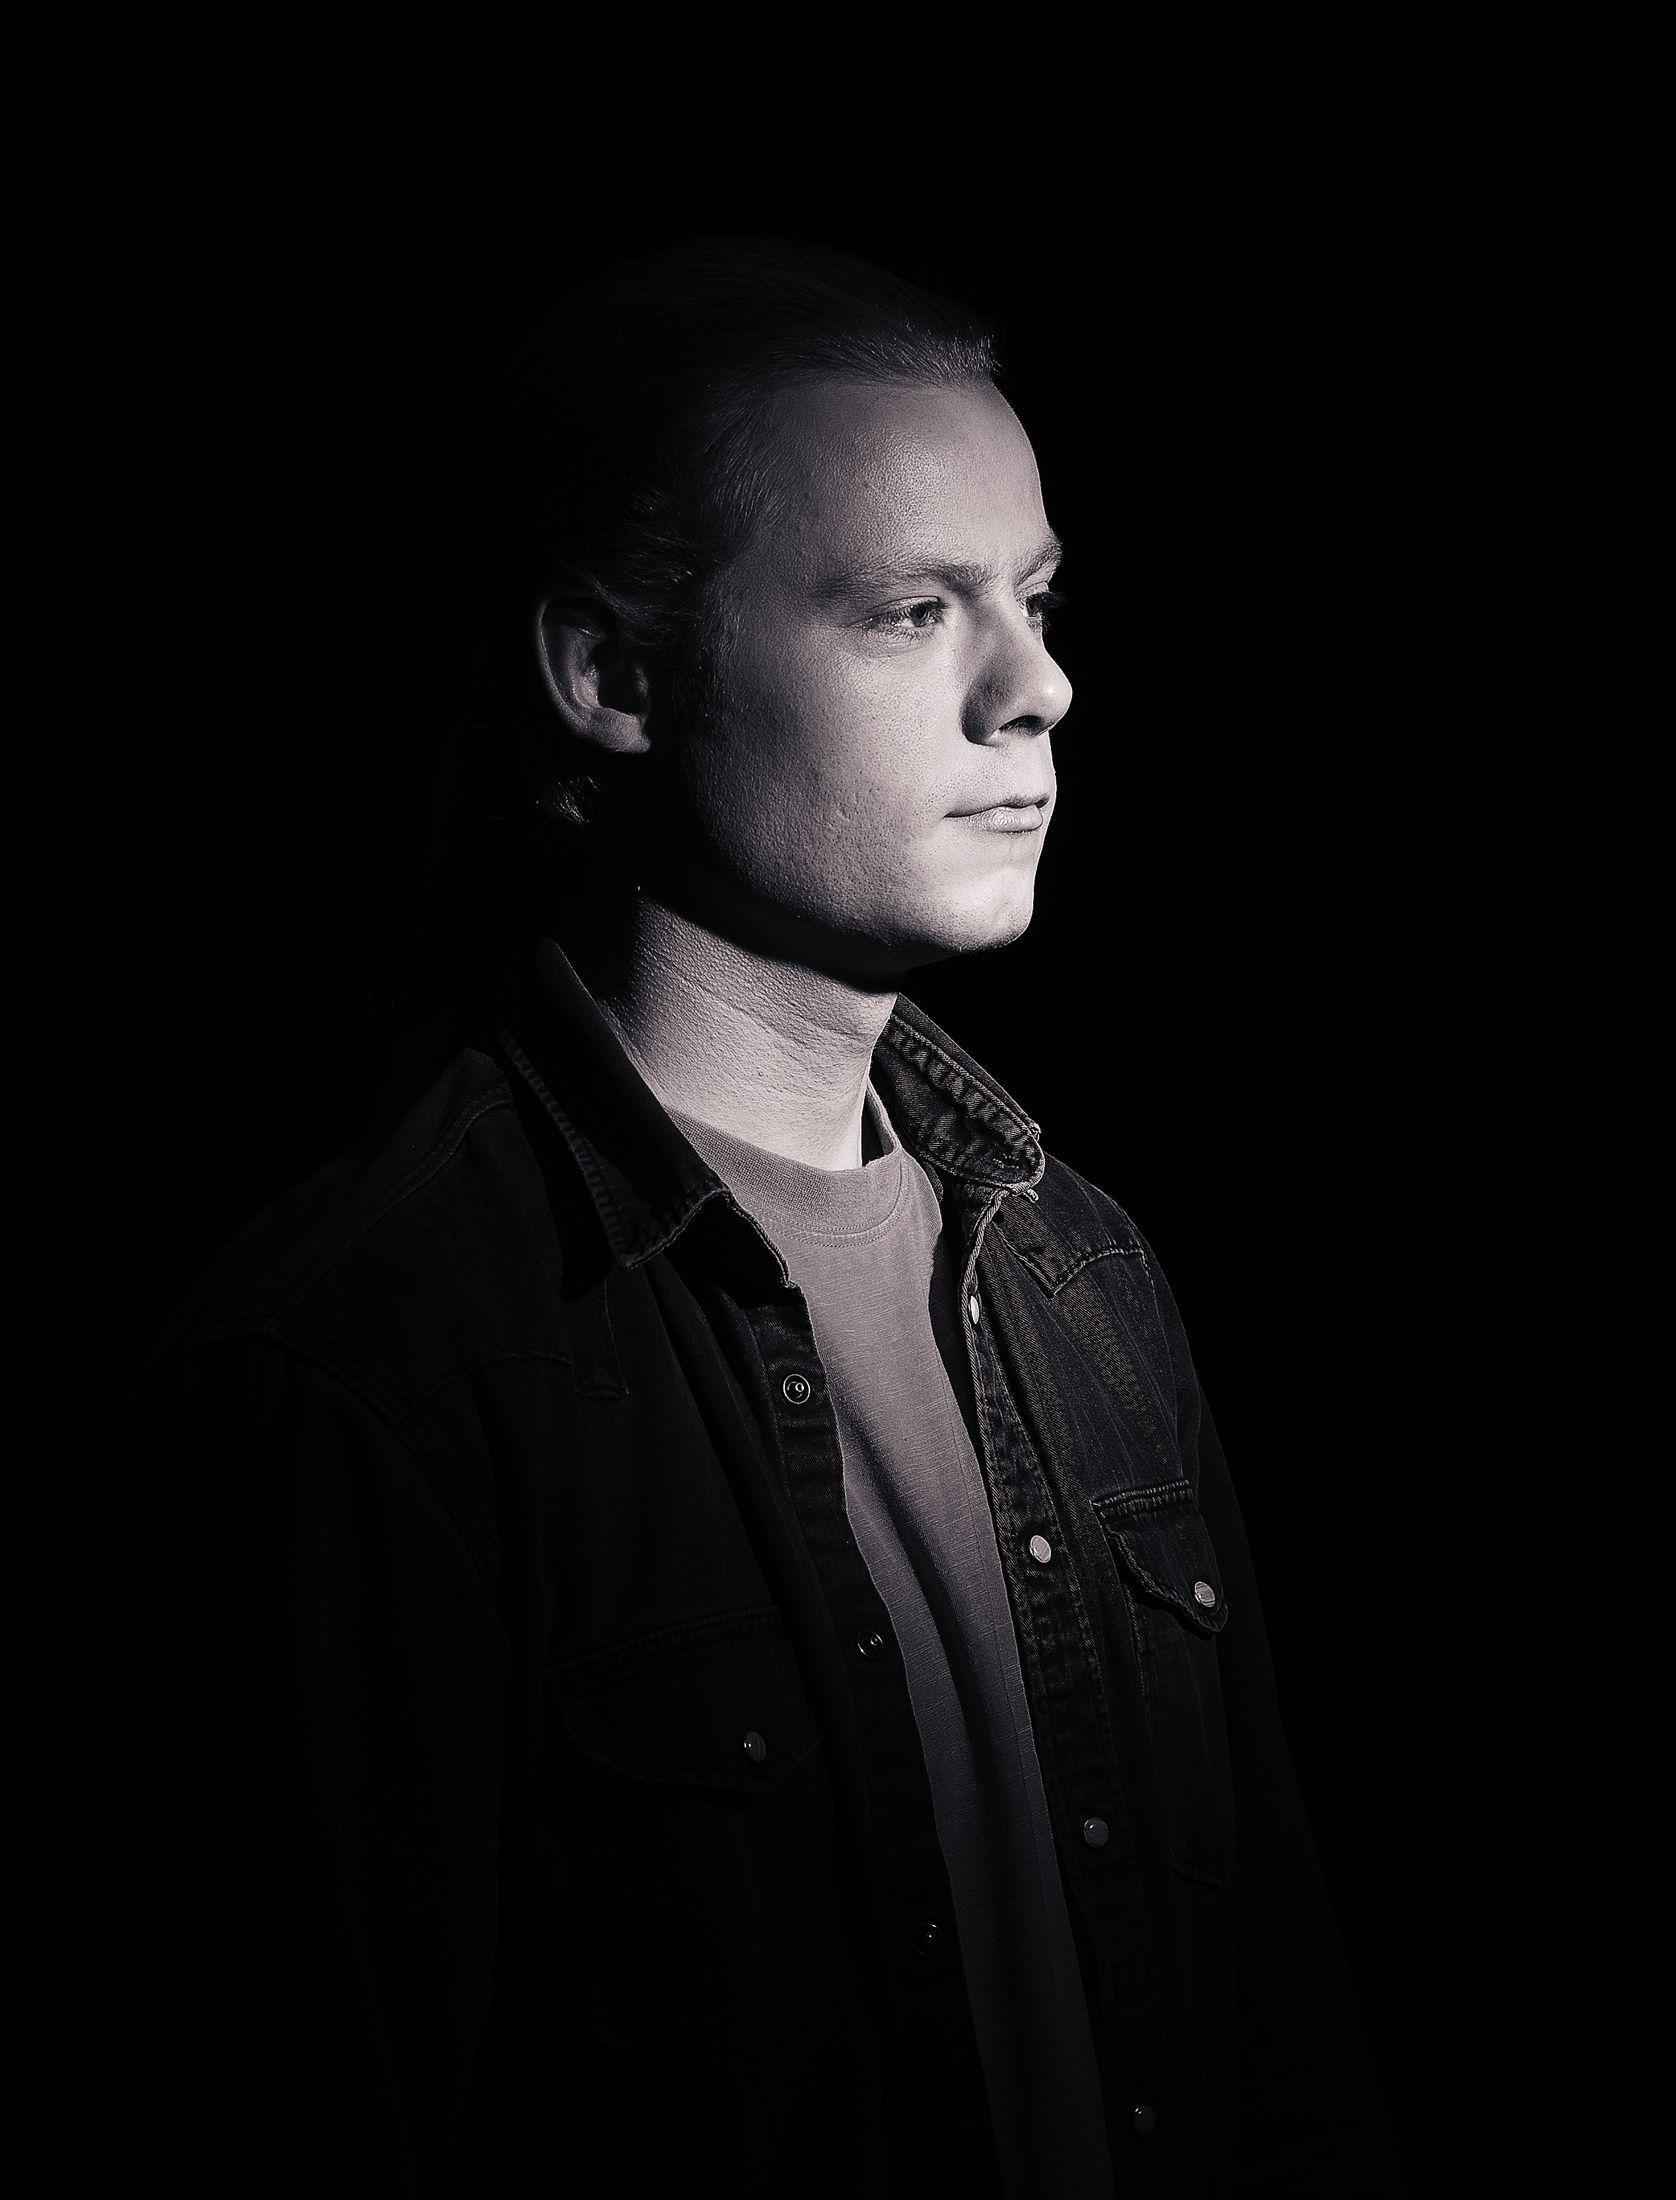 Ingvar Haukur Guðmundsson